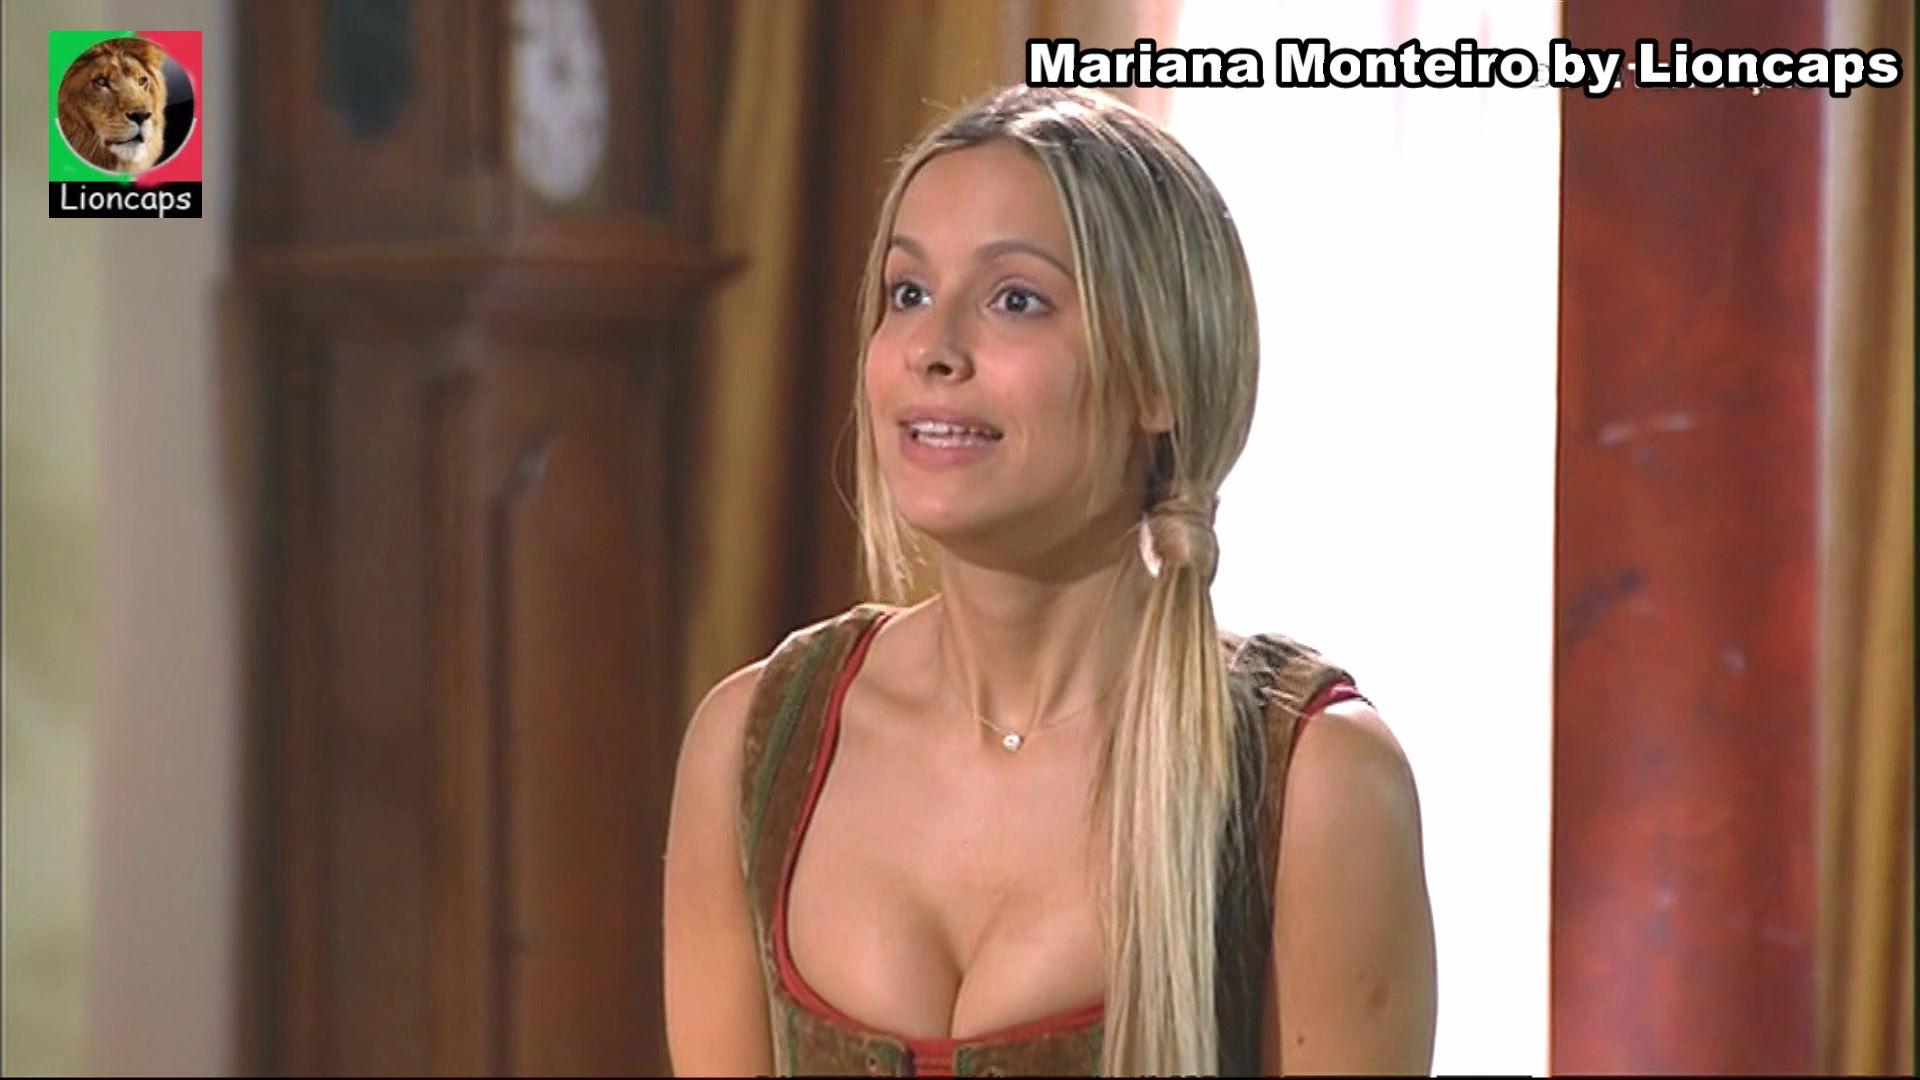 973837148_mariana_monteiro_vs190209_1923_122_188lo.JPG